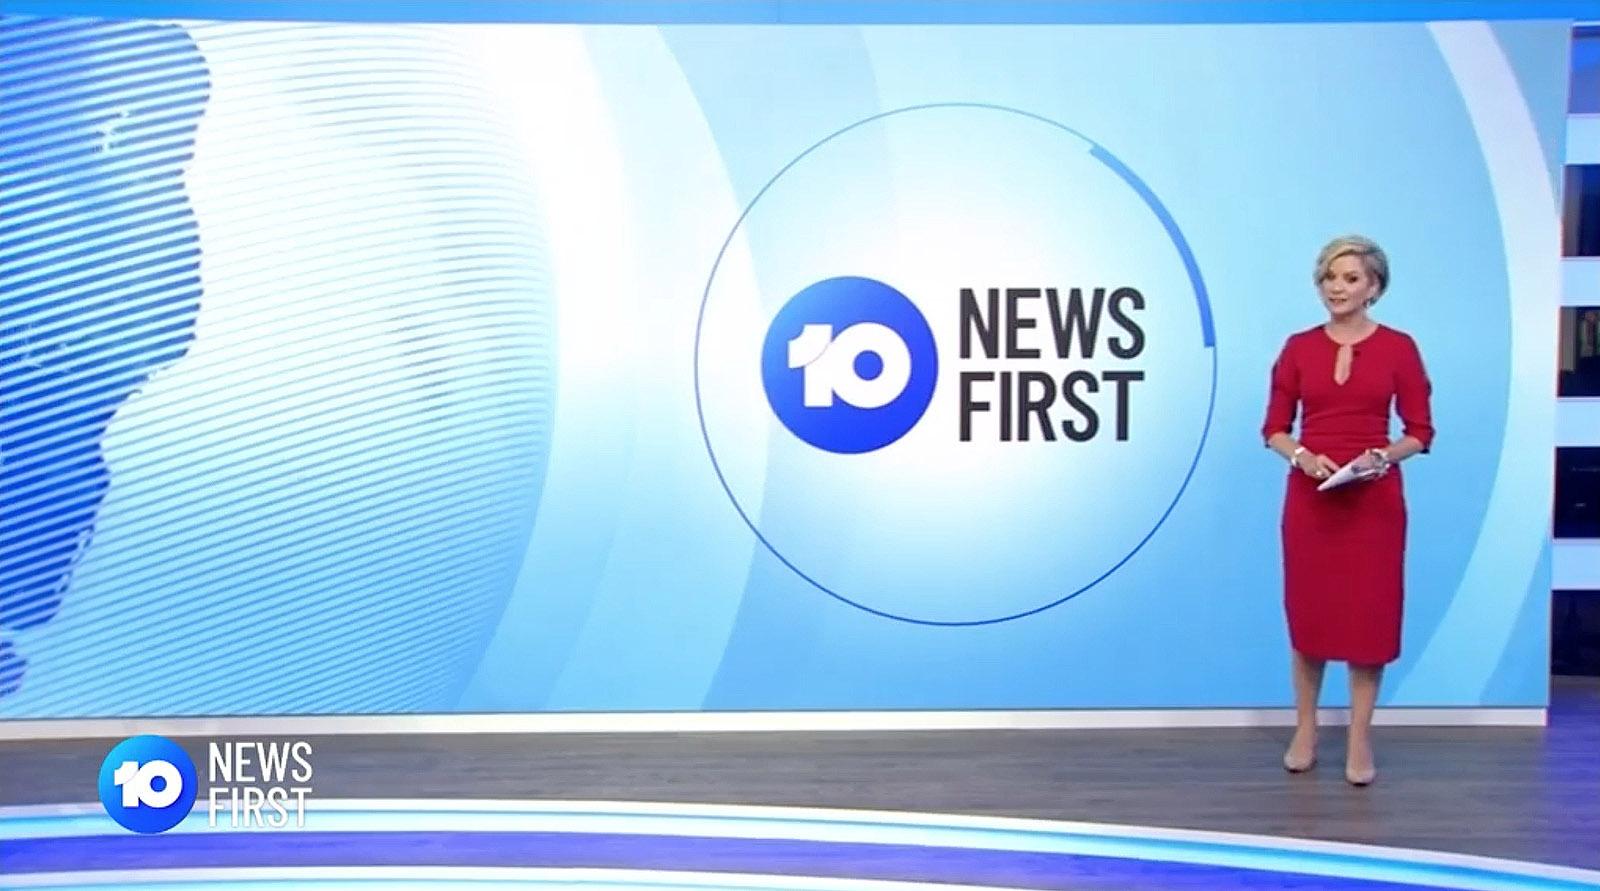 NCS_Network-10-Sydney-10-News-First-studio_024